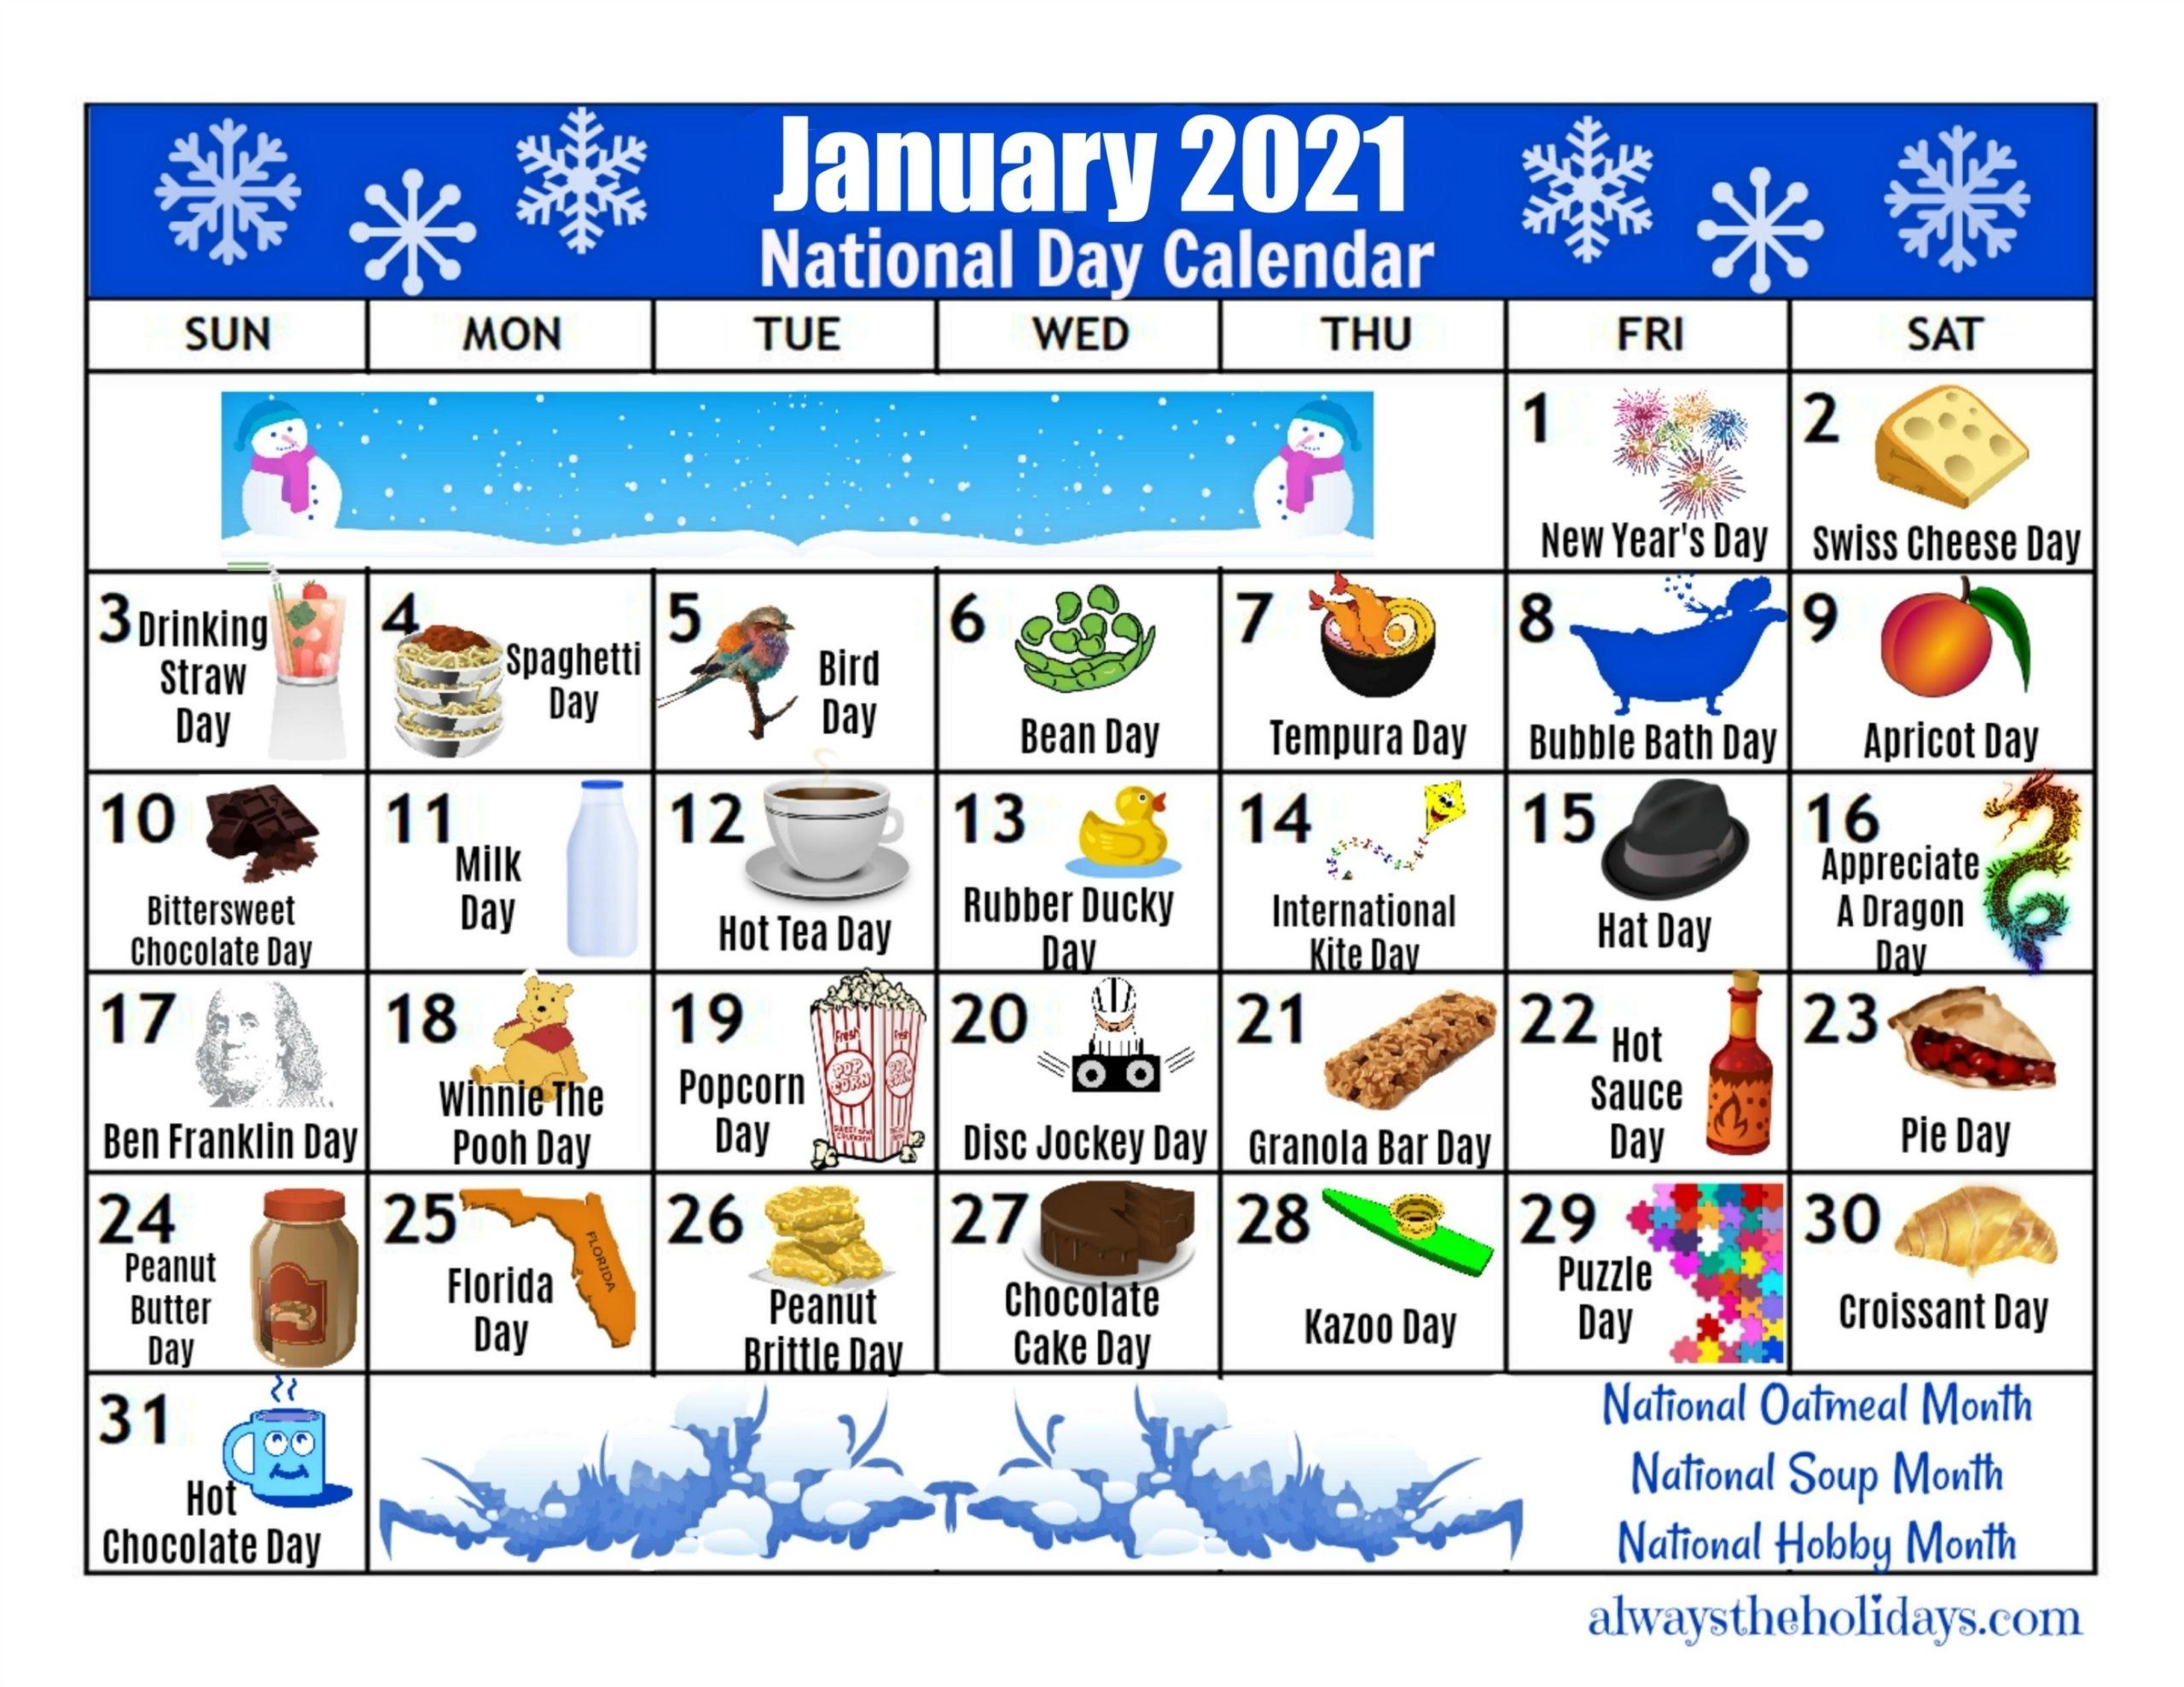 January Printable National Day Calendar 2021 - Free Planning